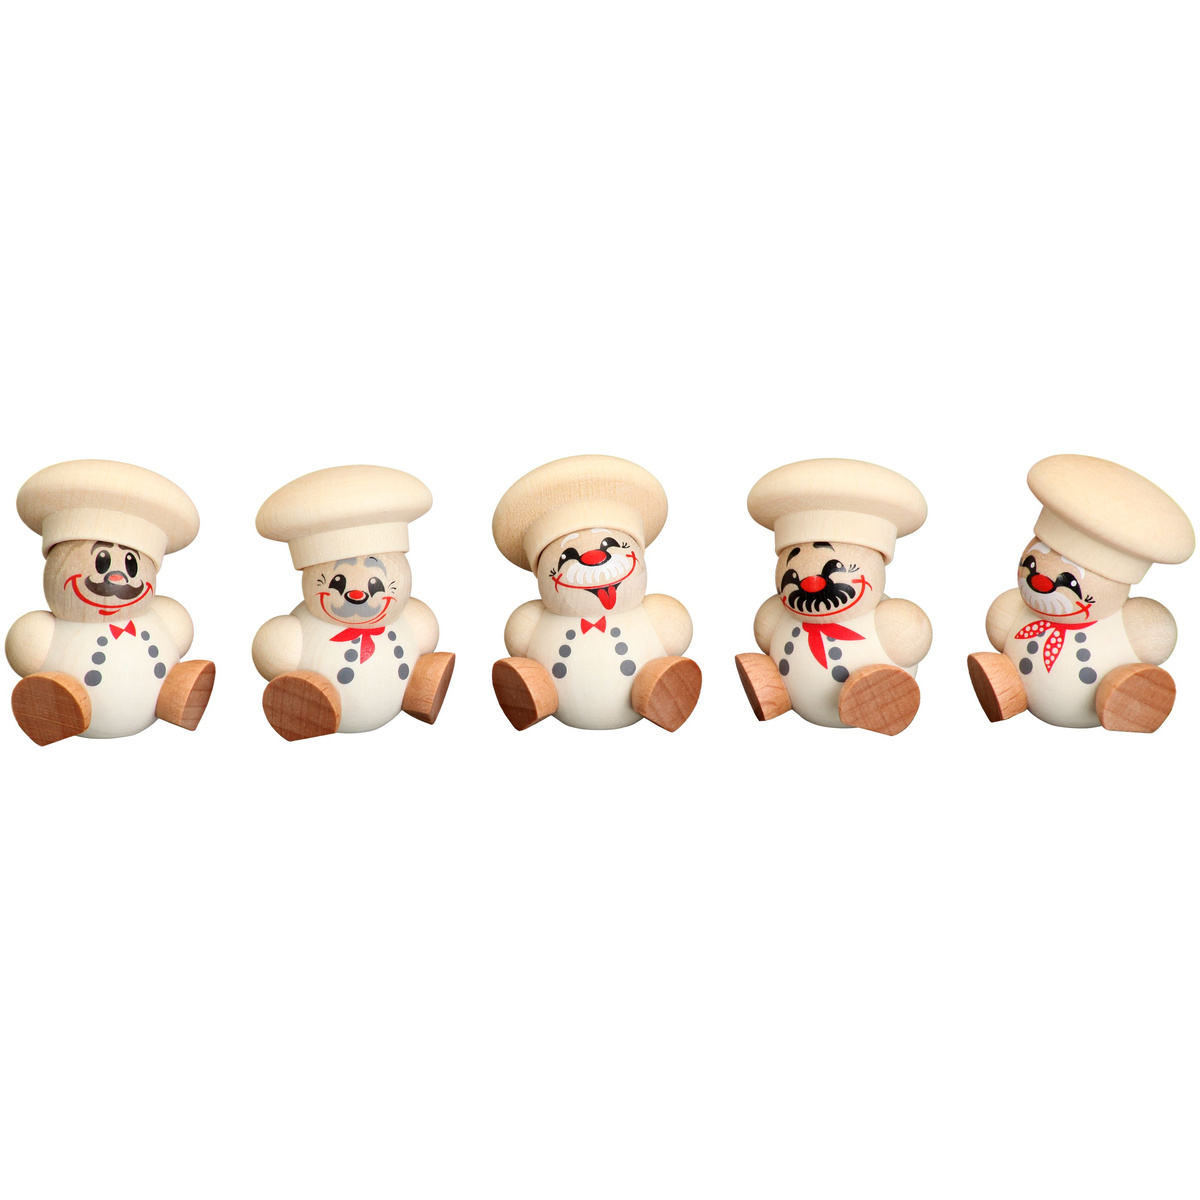 Baumbehang kugelfiguren koch 5er set von seiffener - Weihnachtsdeko figuren ...